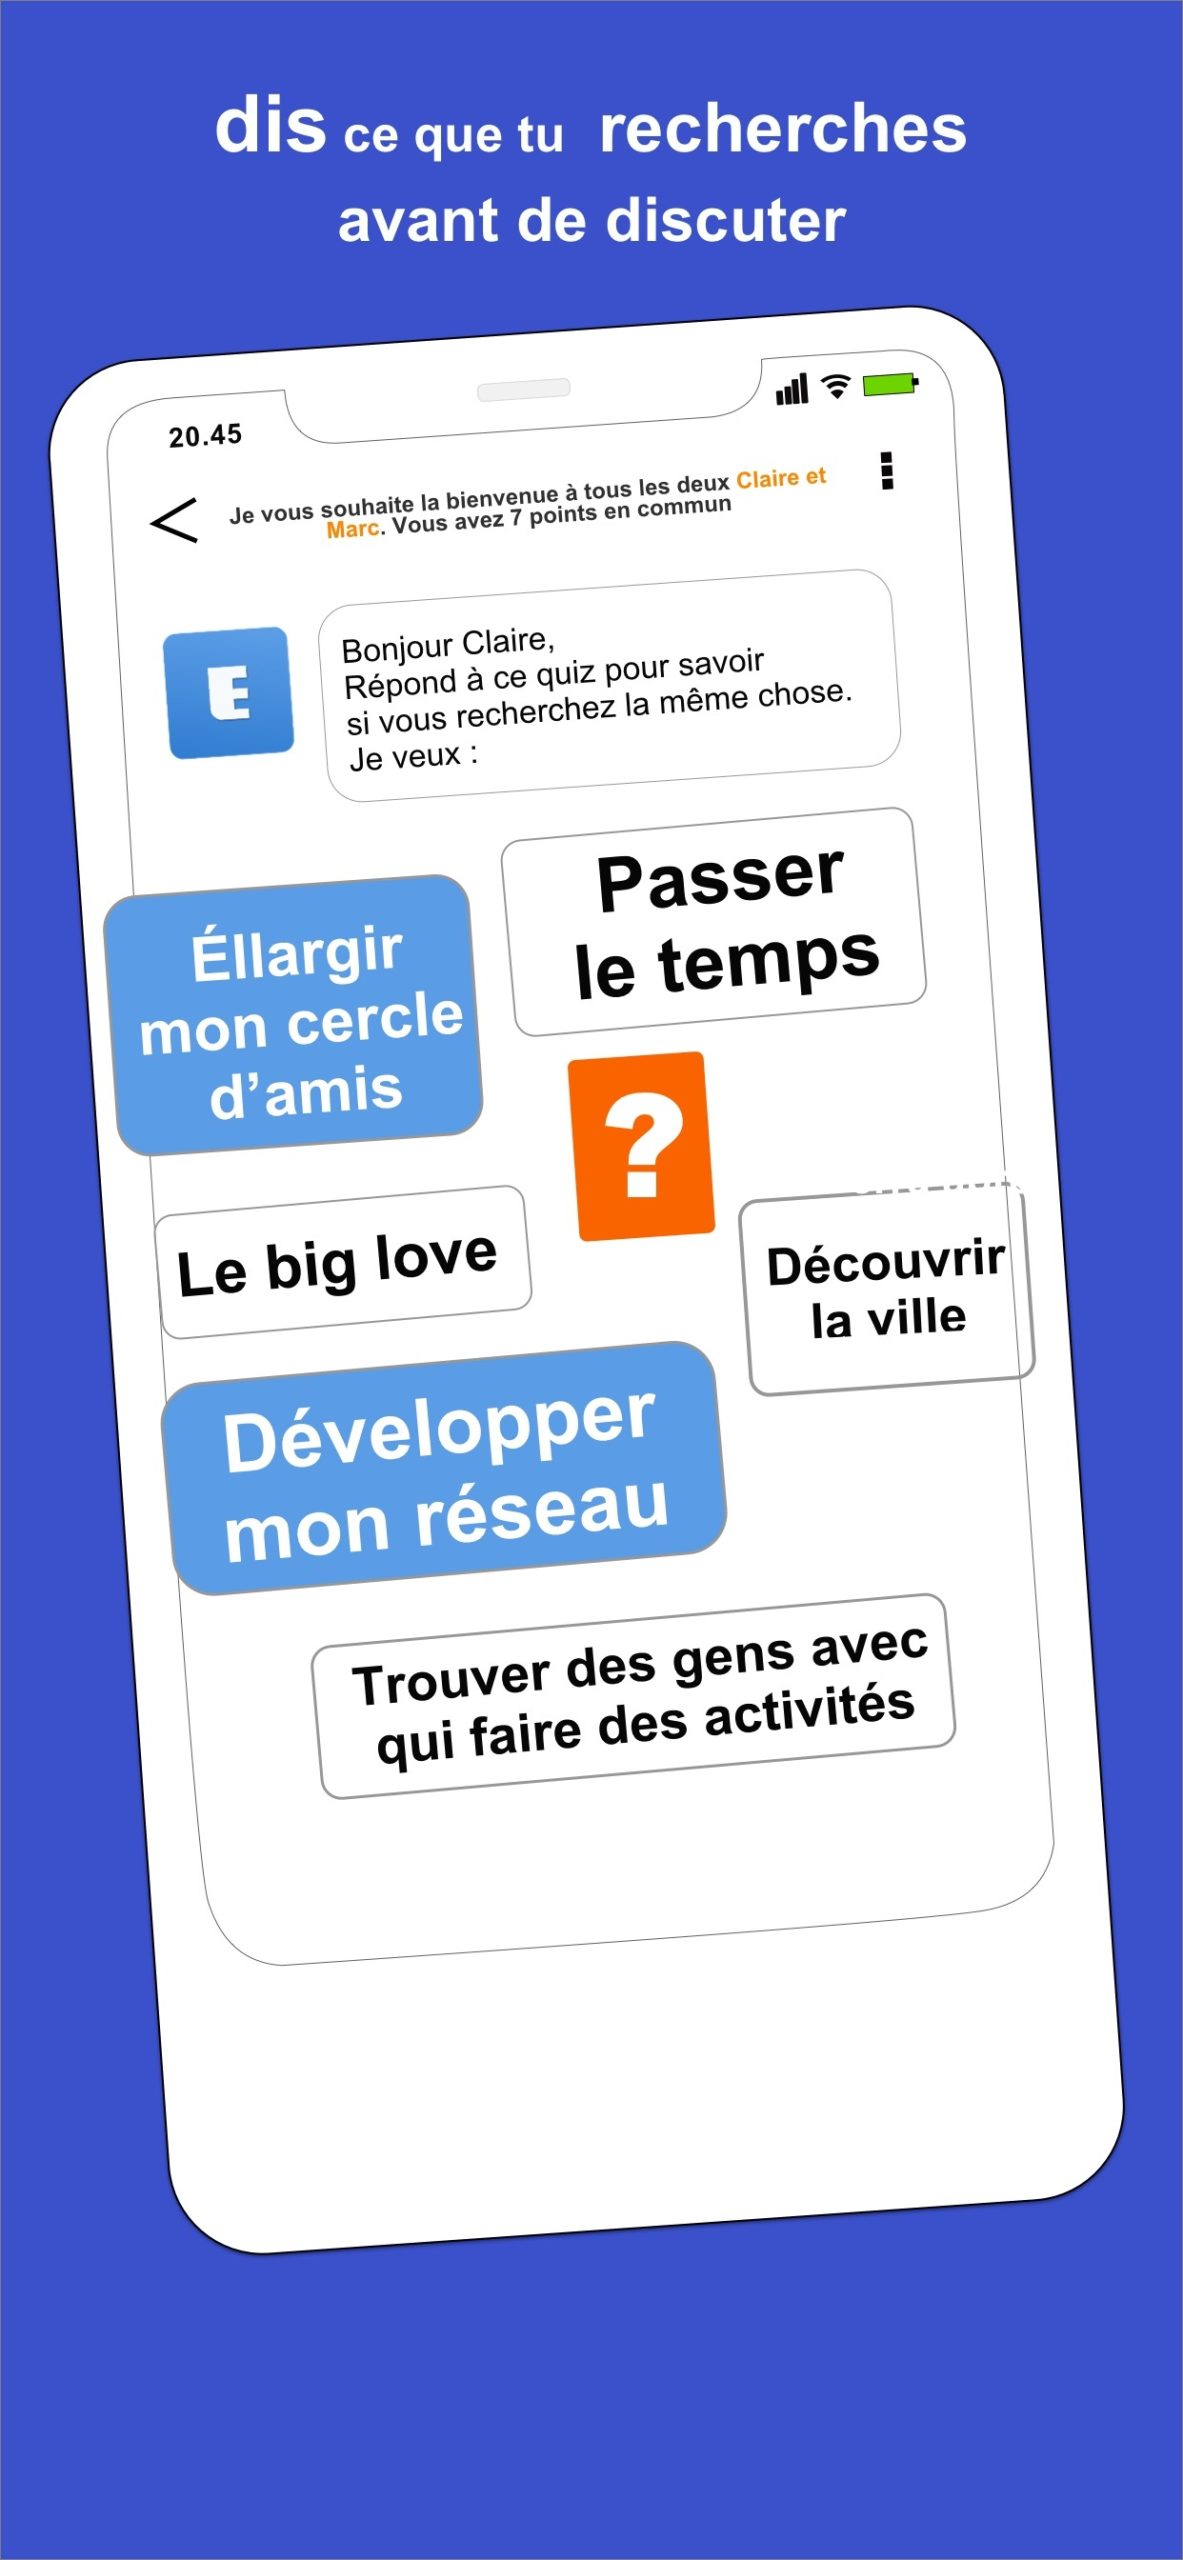 application-iphone-ios-apple-elyot-developpeur-freelance-bordeaux-9